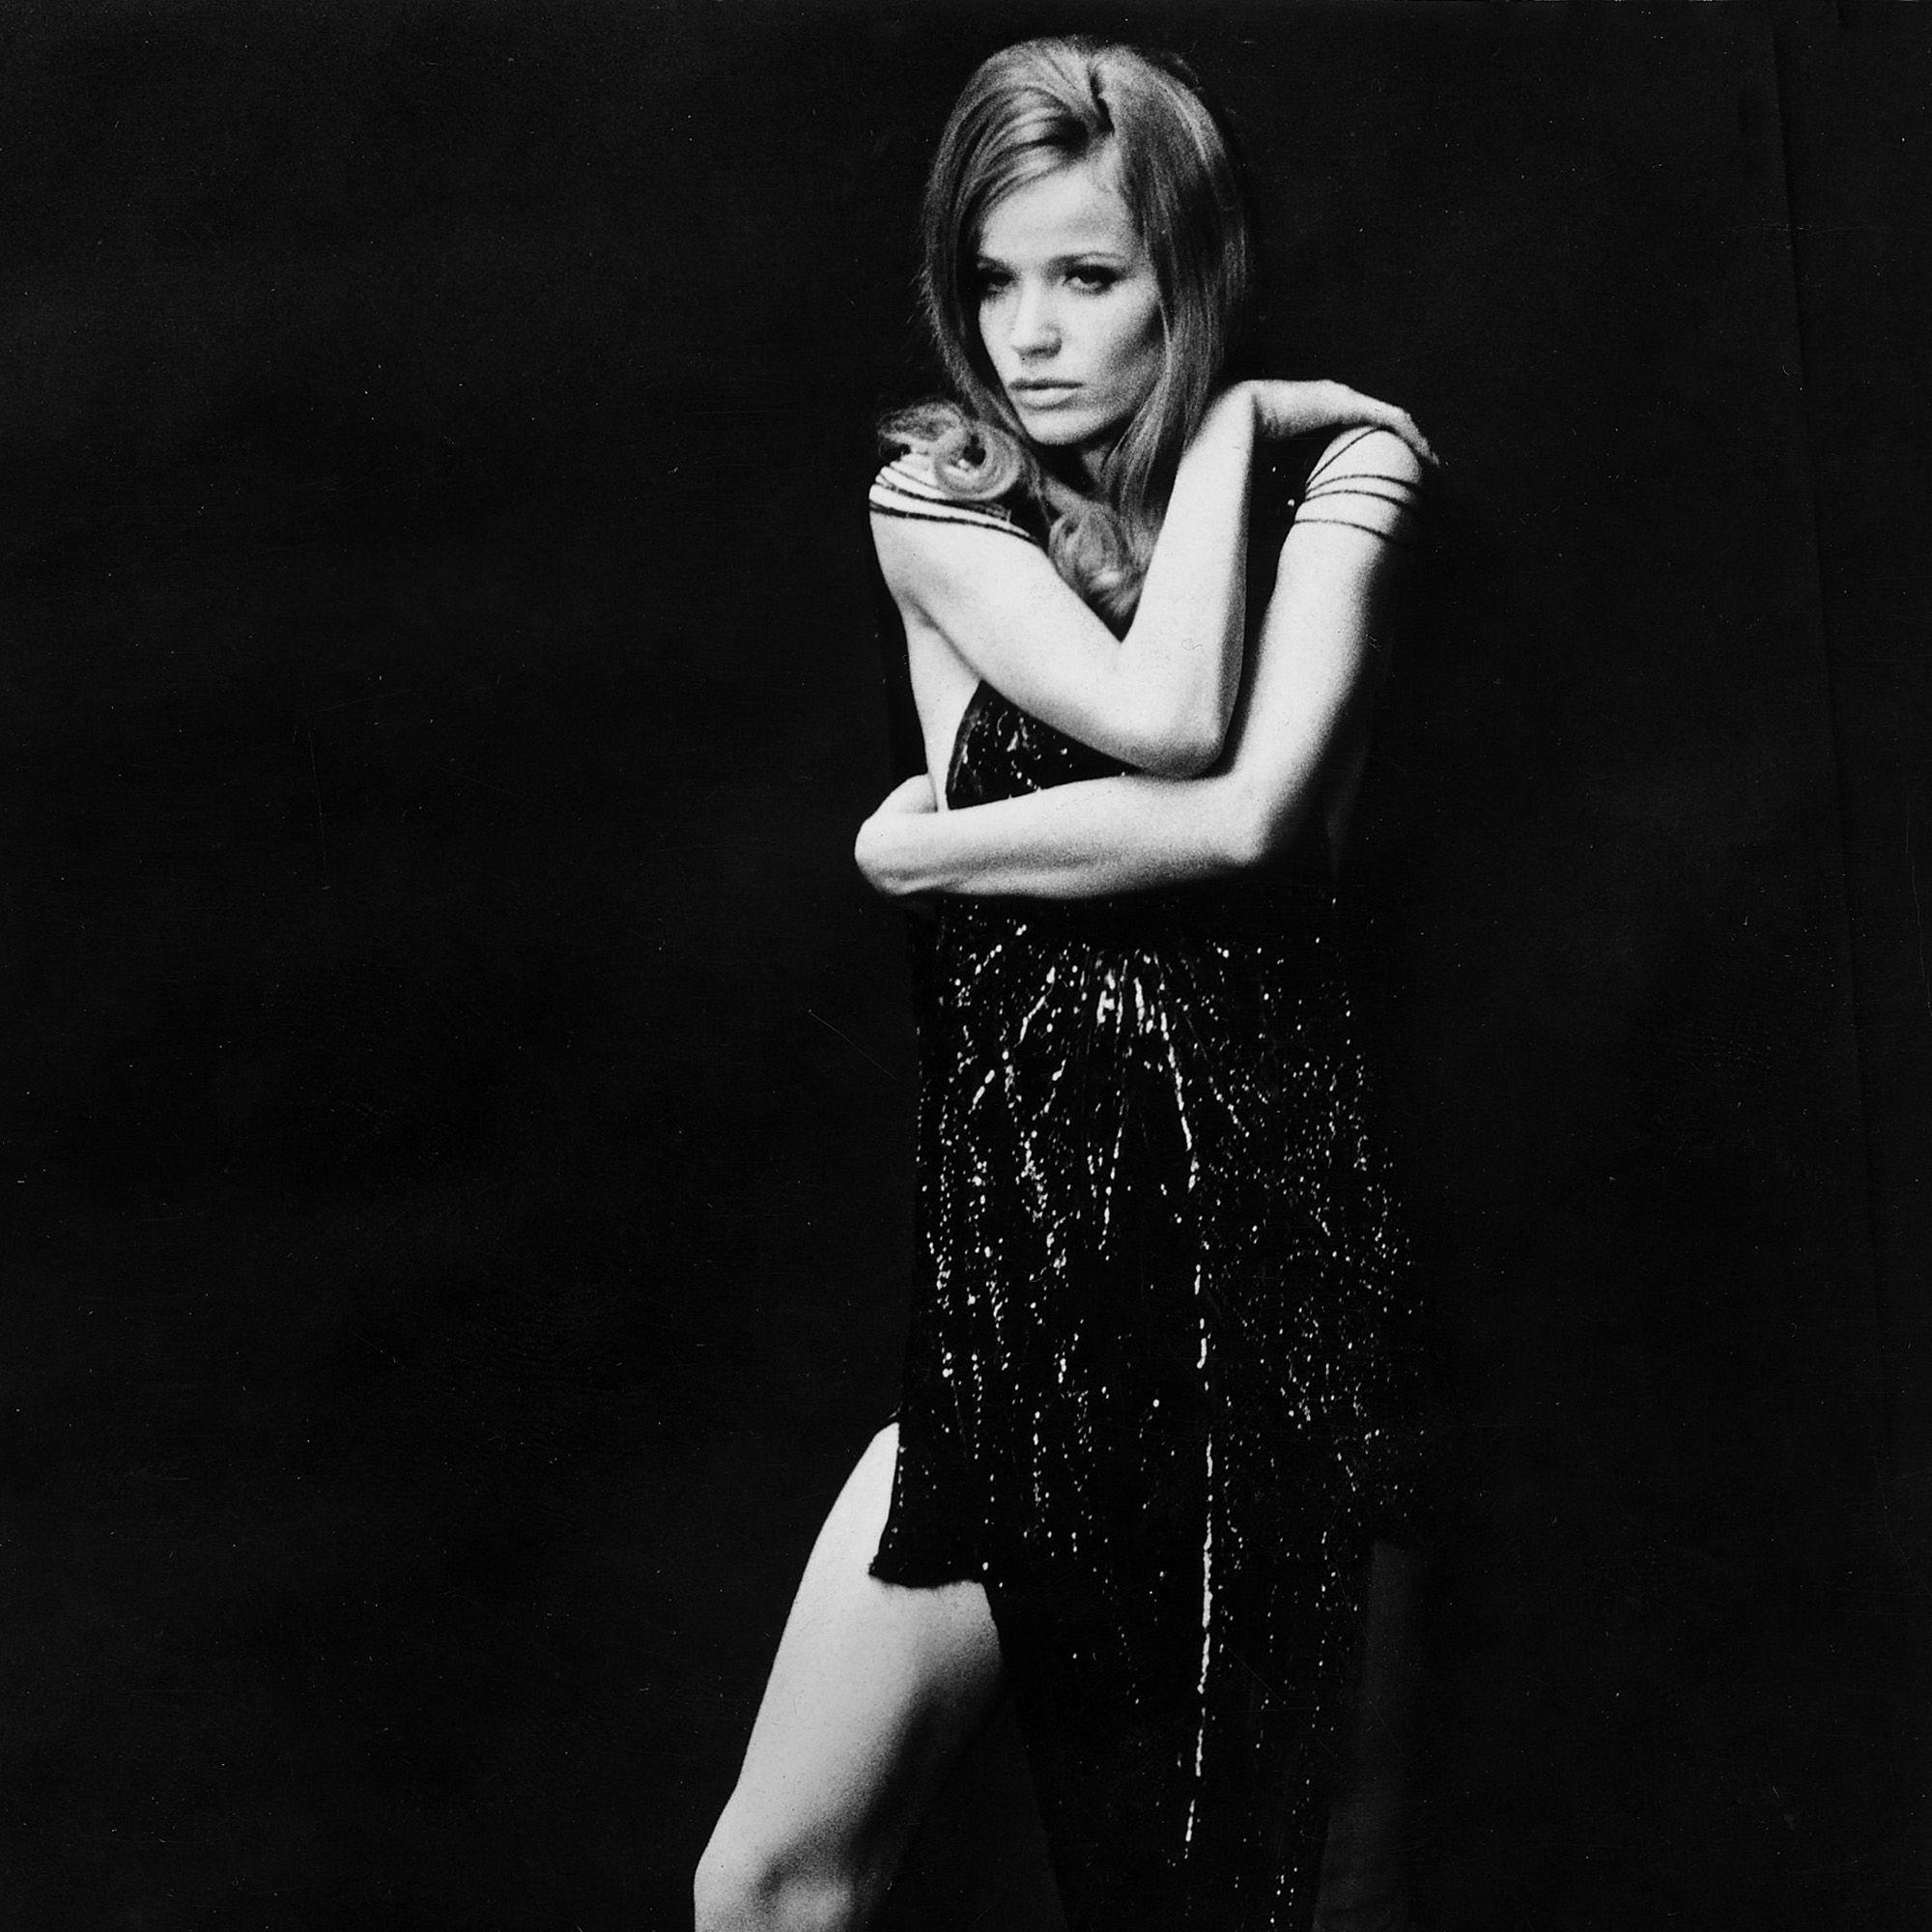 (GERMANY OUT) Countess Vera von Lehndorff, actress, model, Germany - in 'Blowup - 1966 (Photo by ullstein bild/ullstein bild via Getty Images)